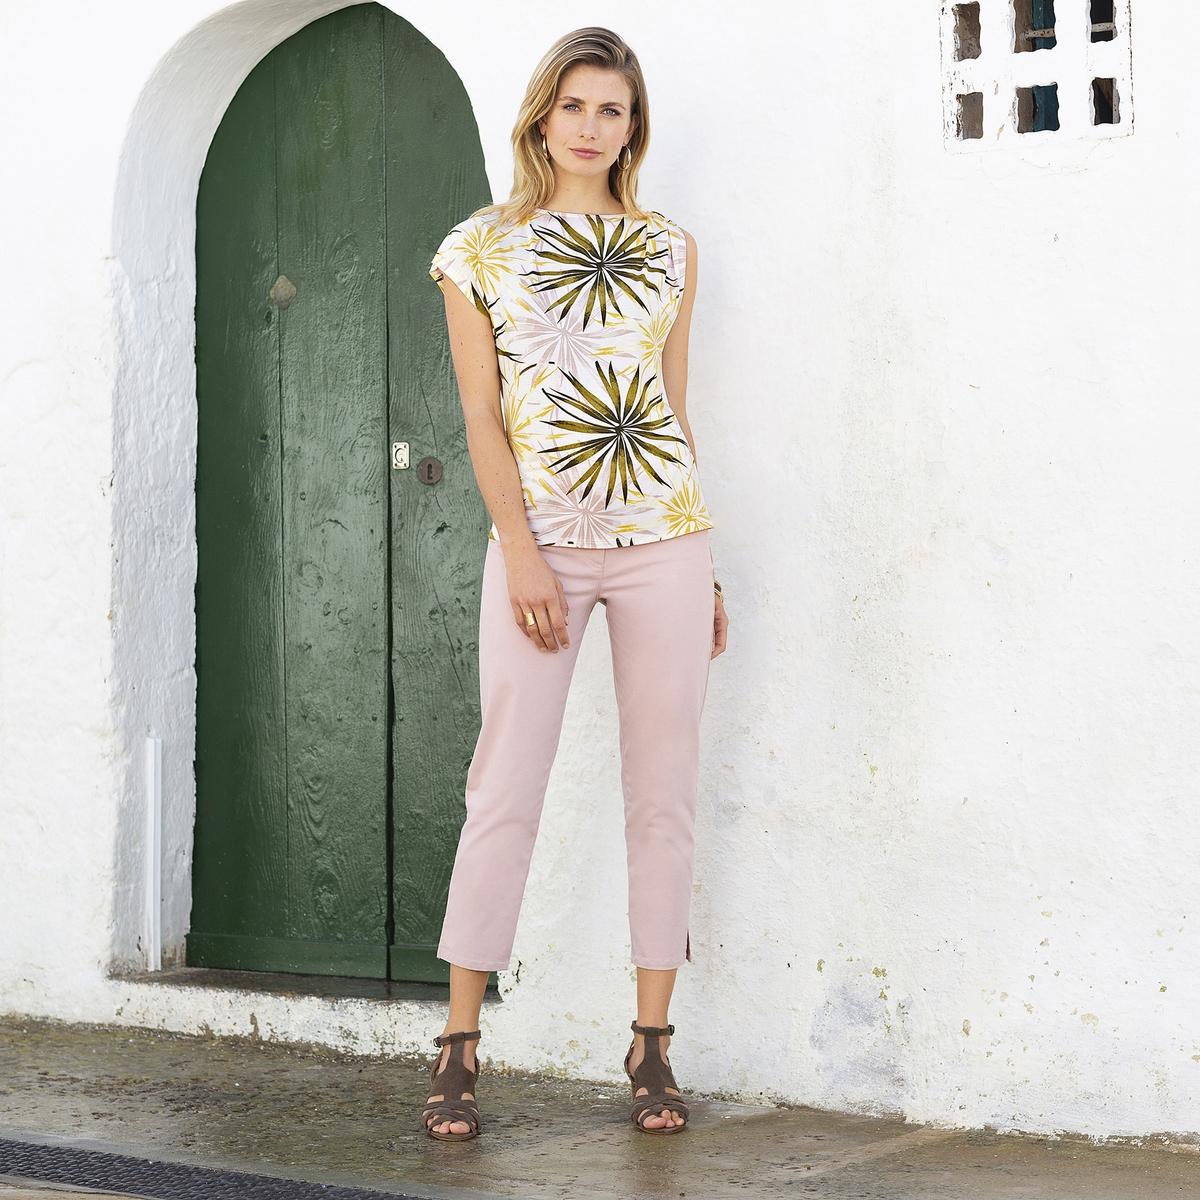 Imagen adicional 3 de producto de Pantalón pesquero bordado, algodón stretch - Anne weyburn